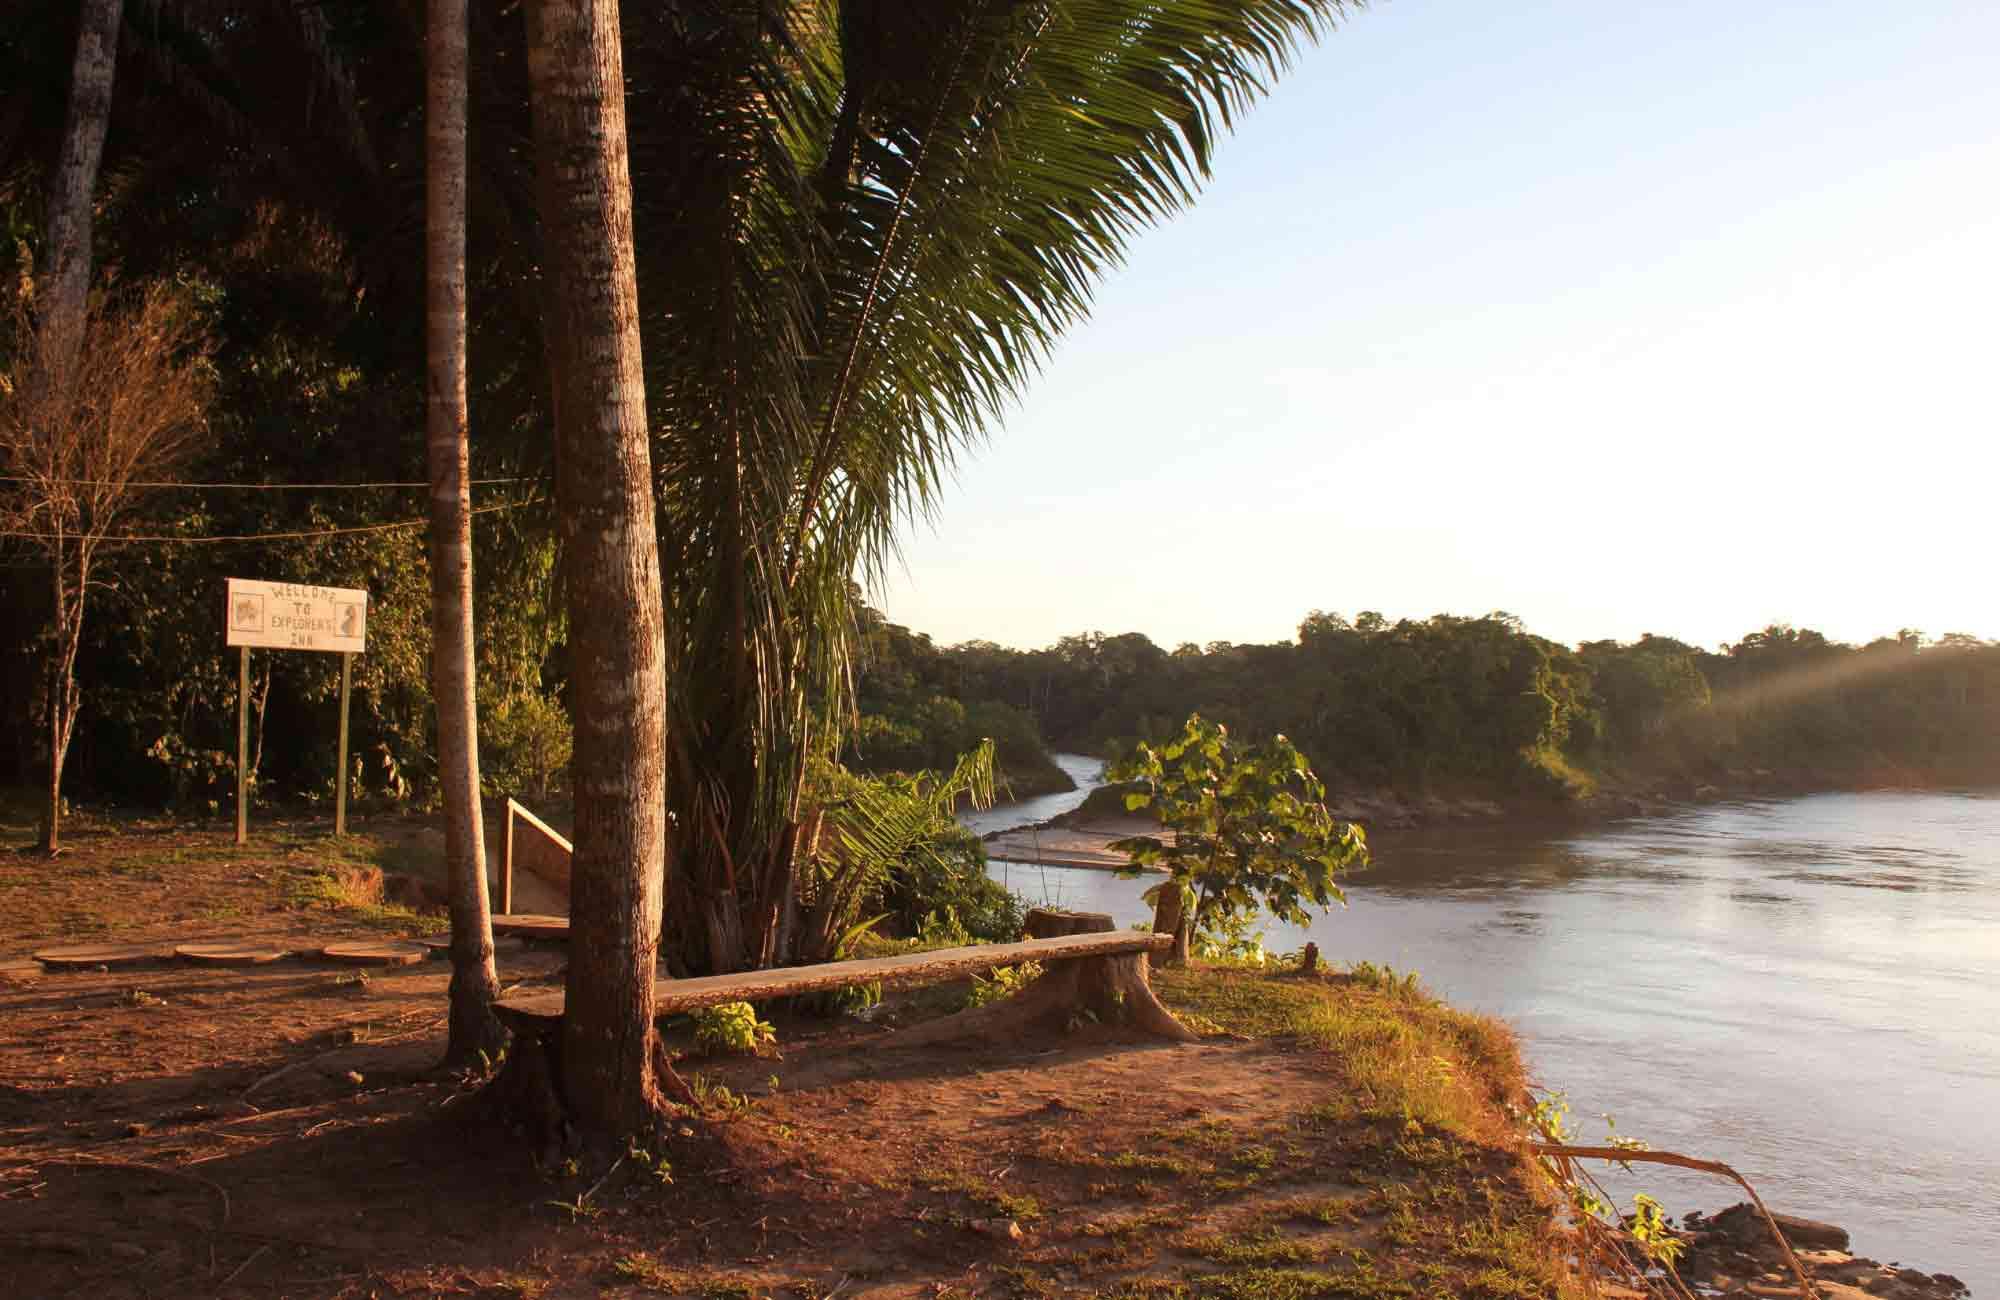 Voyage Pérou - Amazonie - Amplitudes